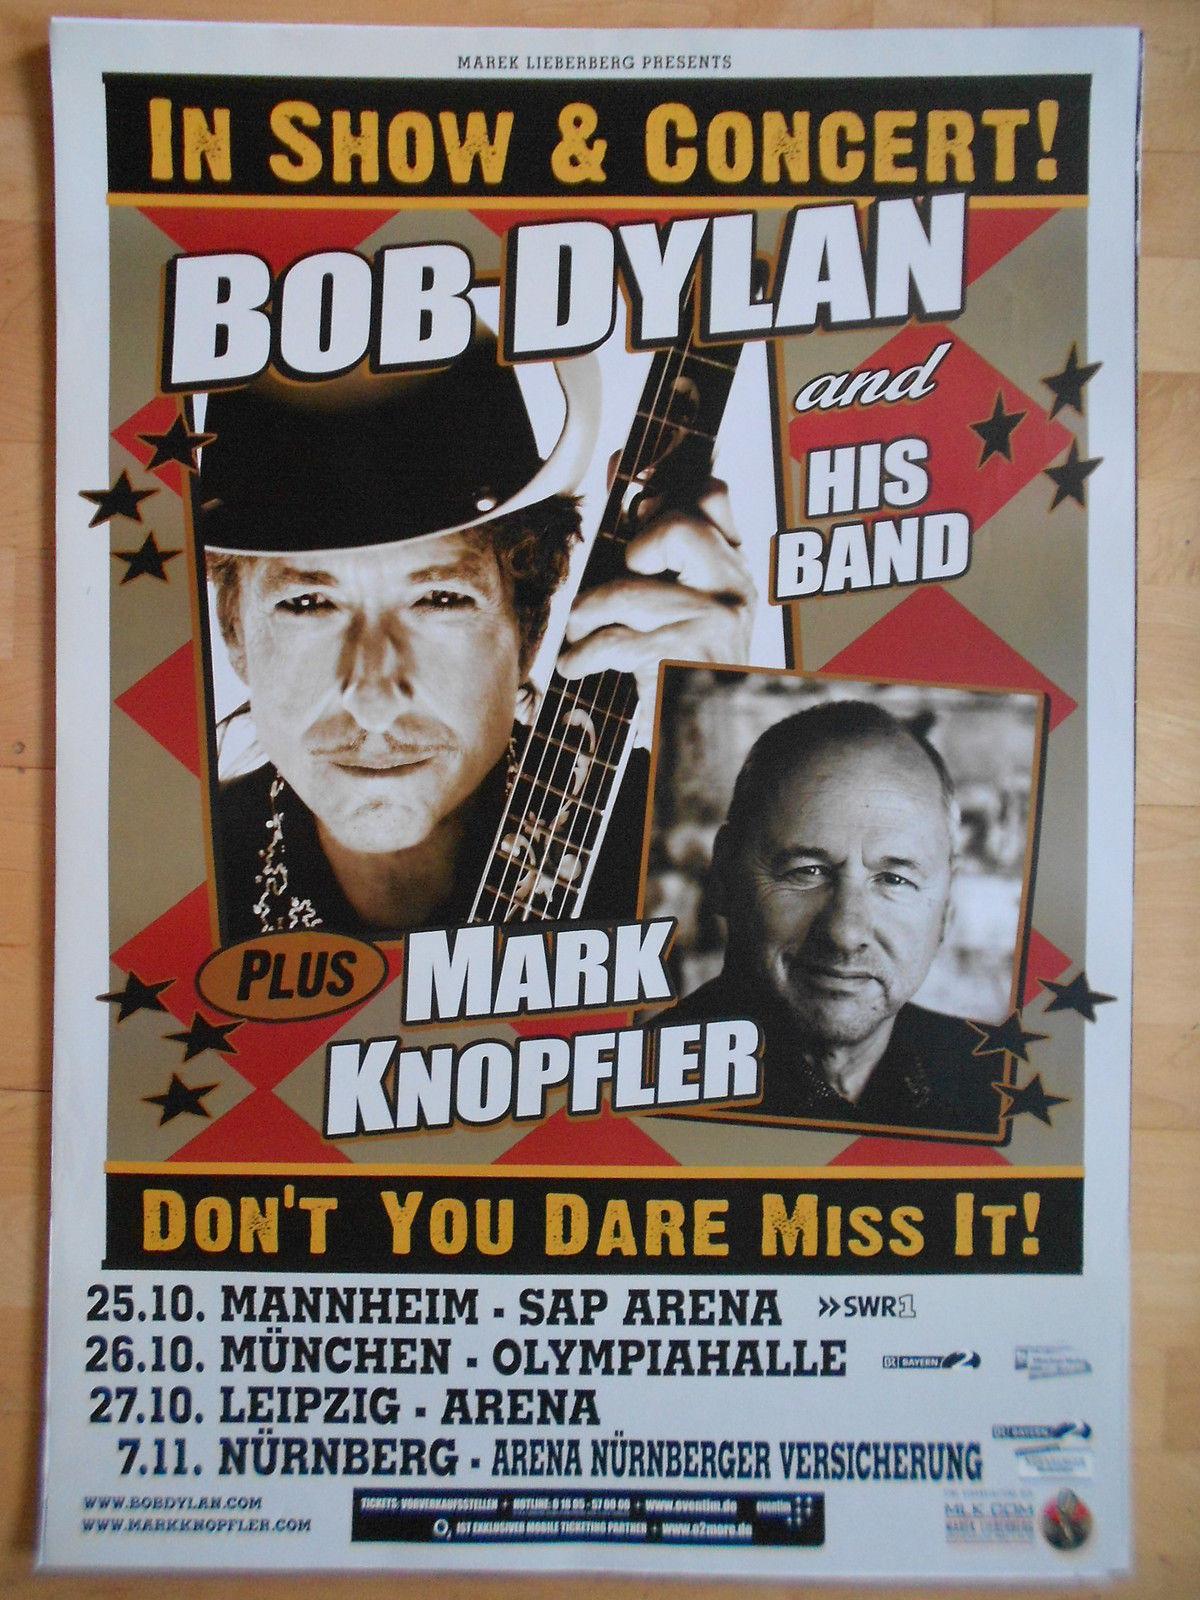 BOB DYLAN – Live in Germany 1978 – 2019 by Christof Graf – cohenpedia.de b07fe03920